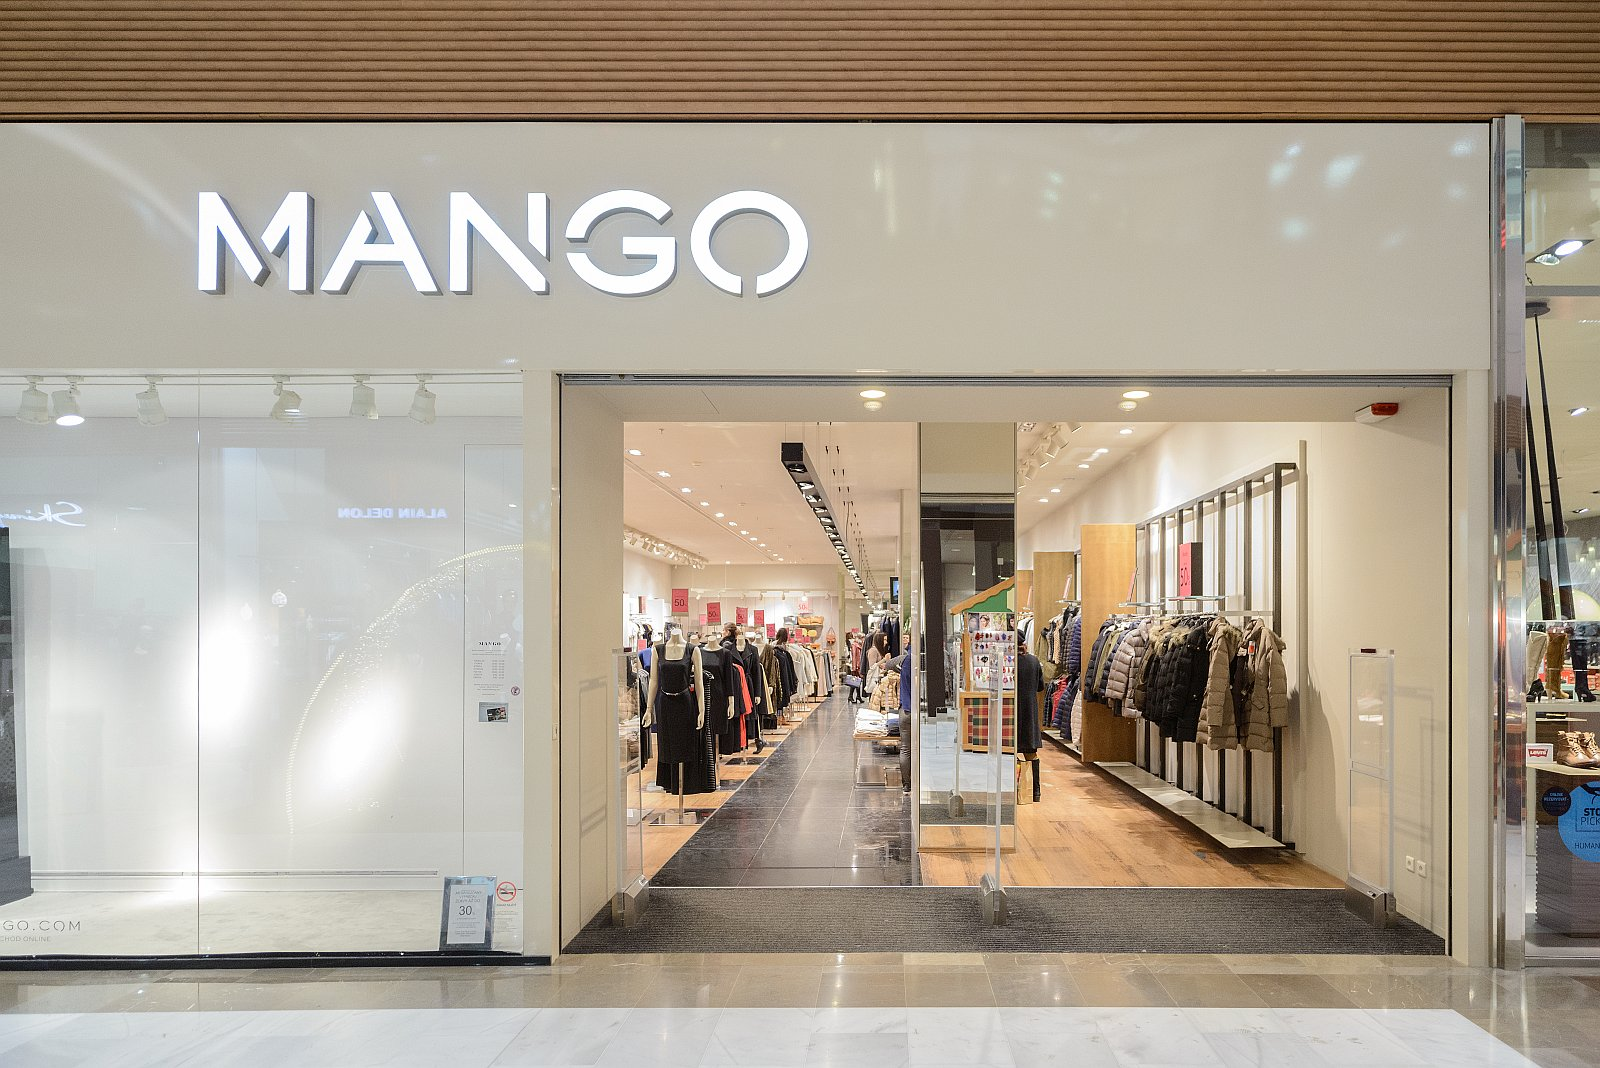 Mango store in Unibail-Rodamco to use LED lighting.